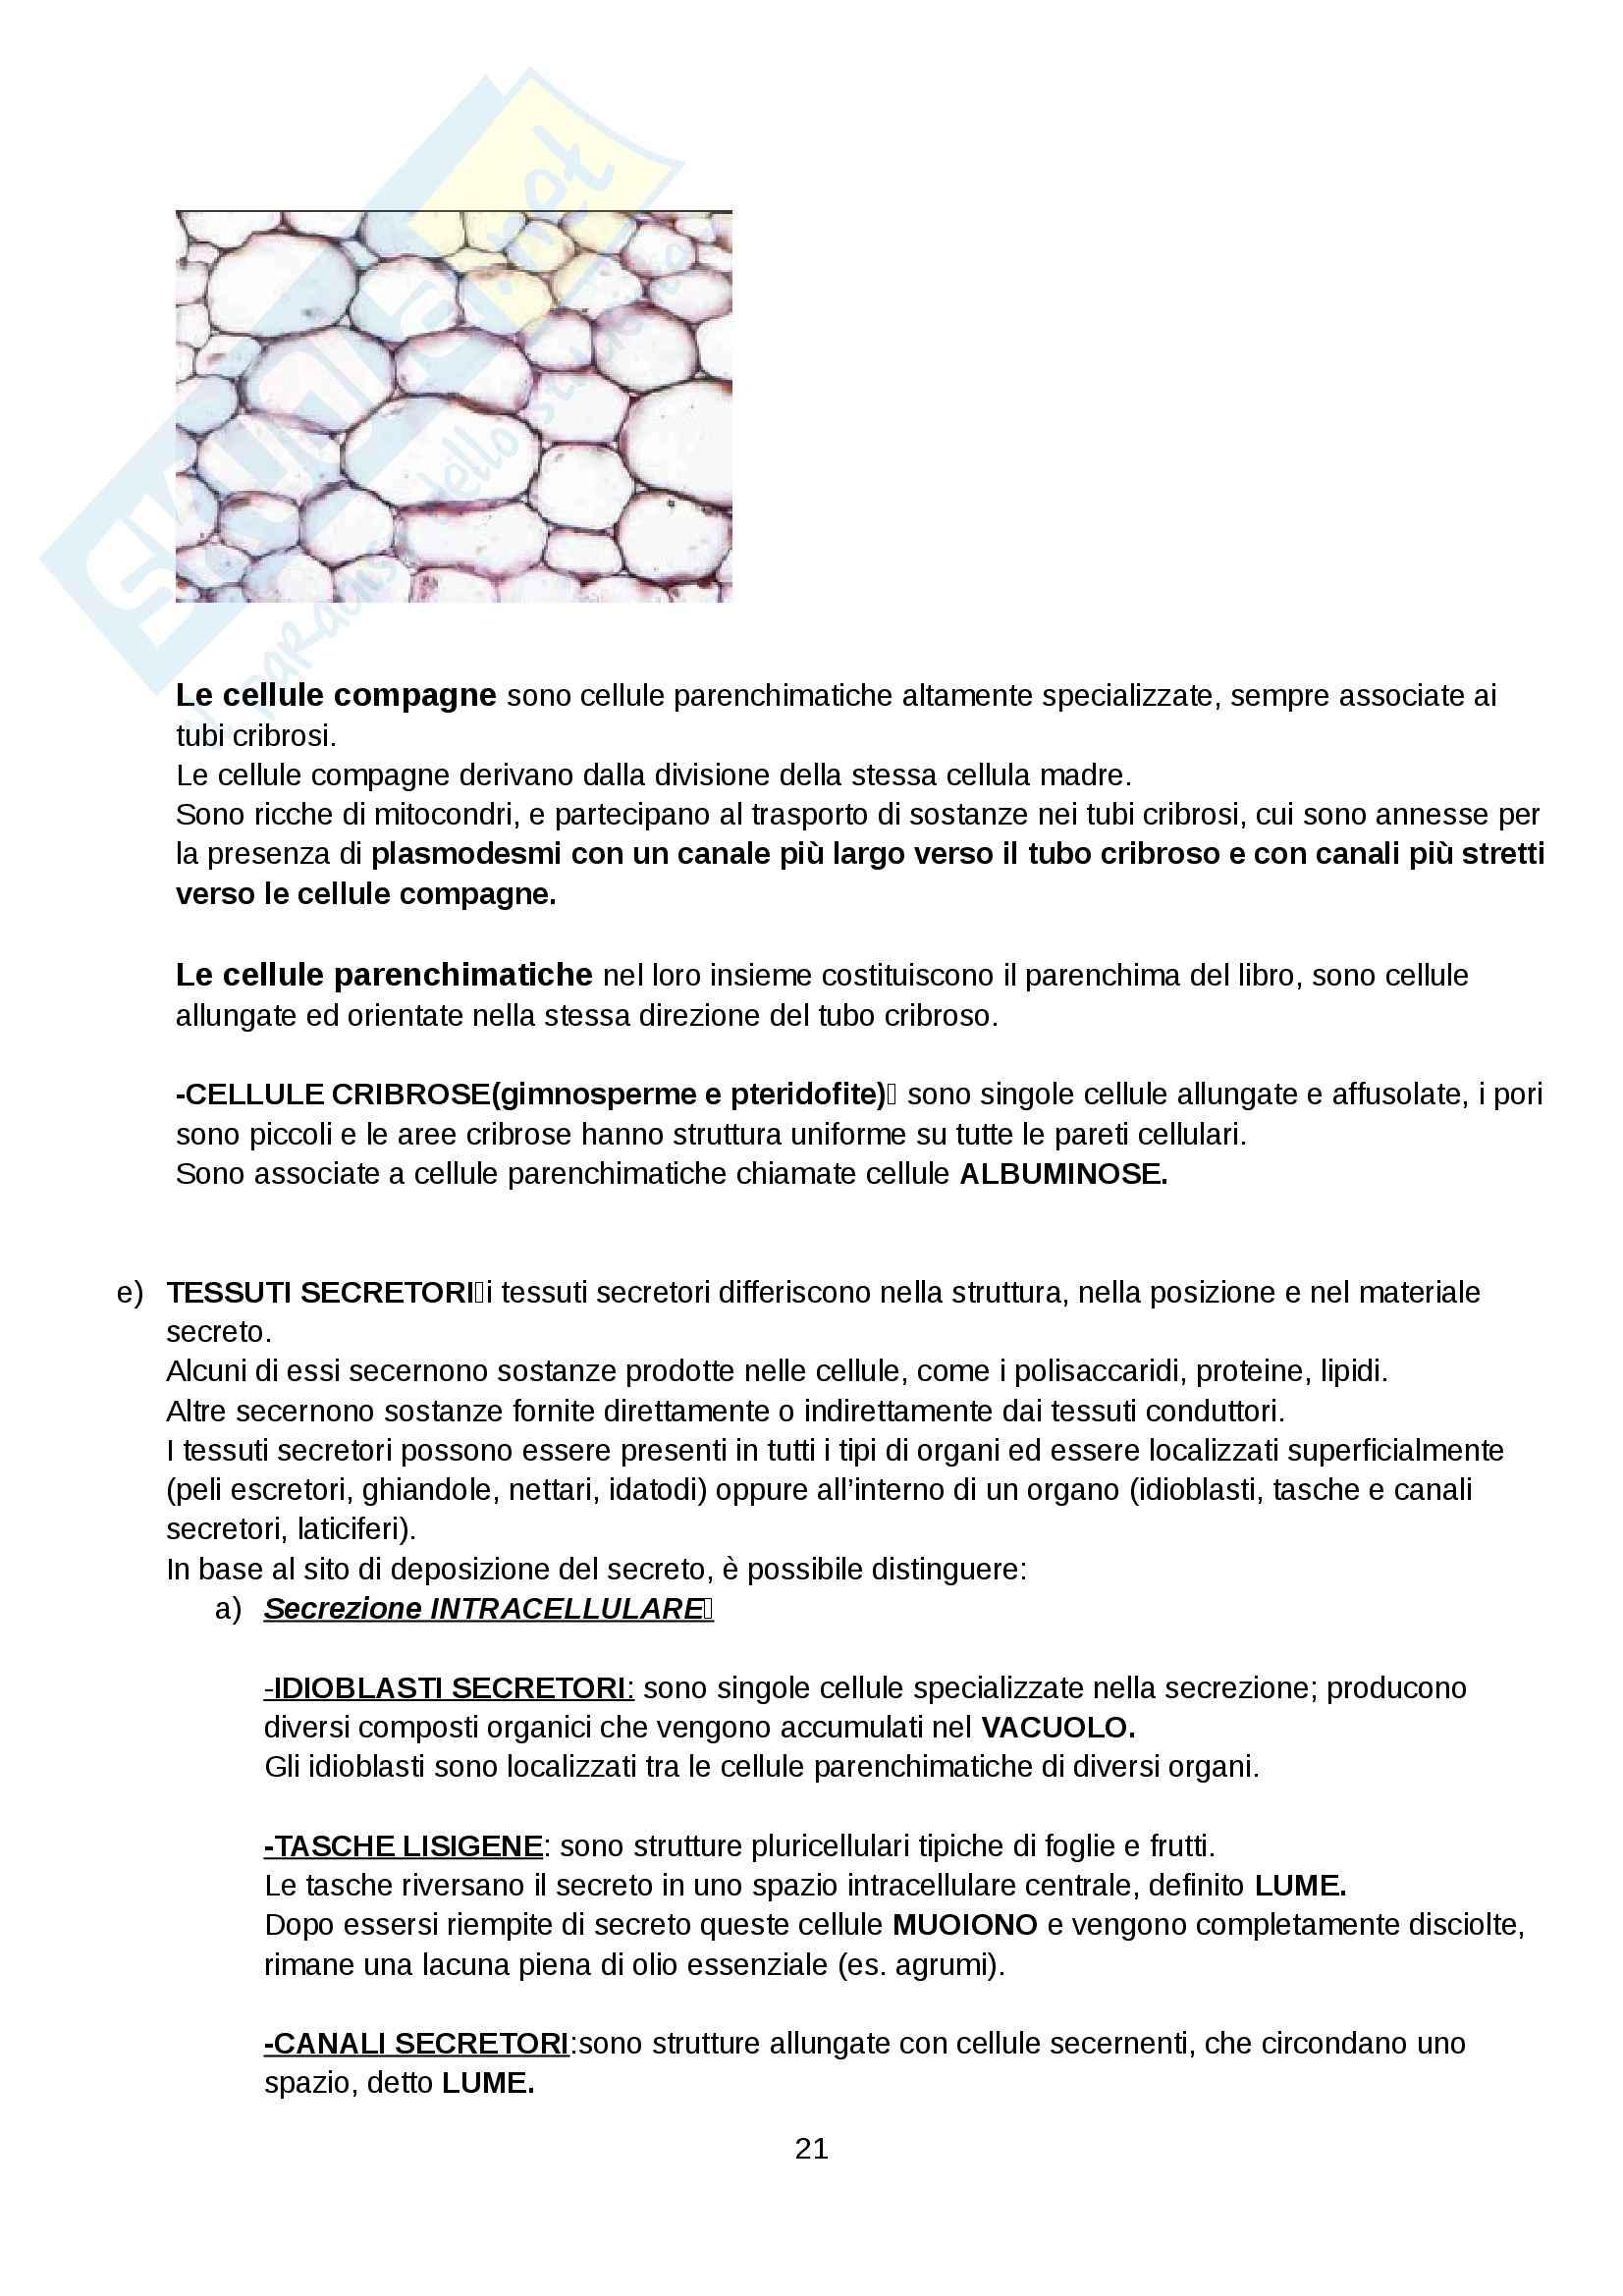 Botanica - Appunti Pag. 21